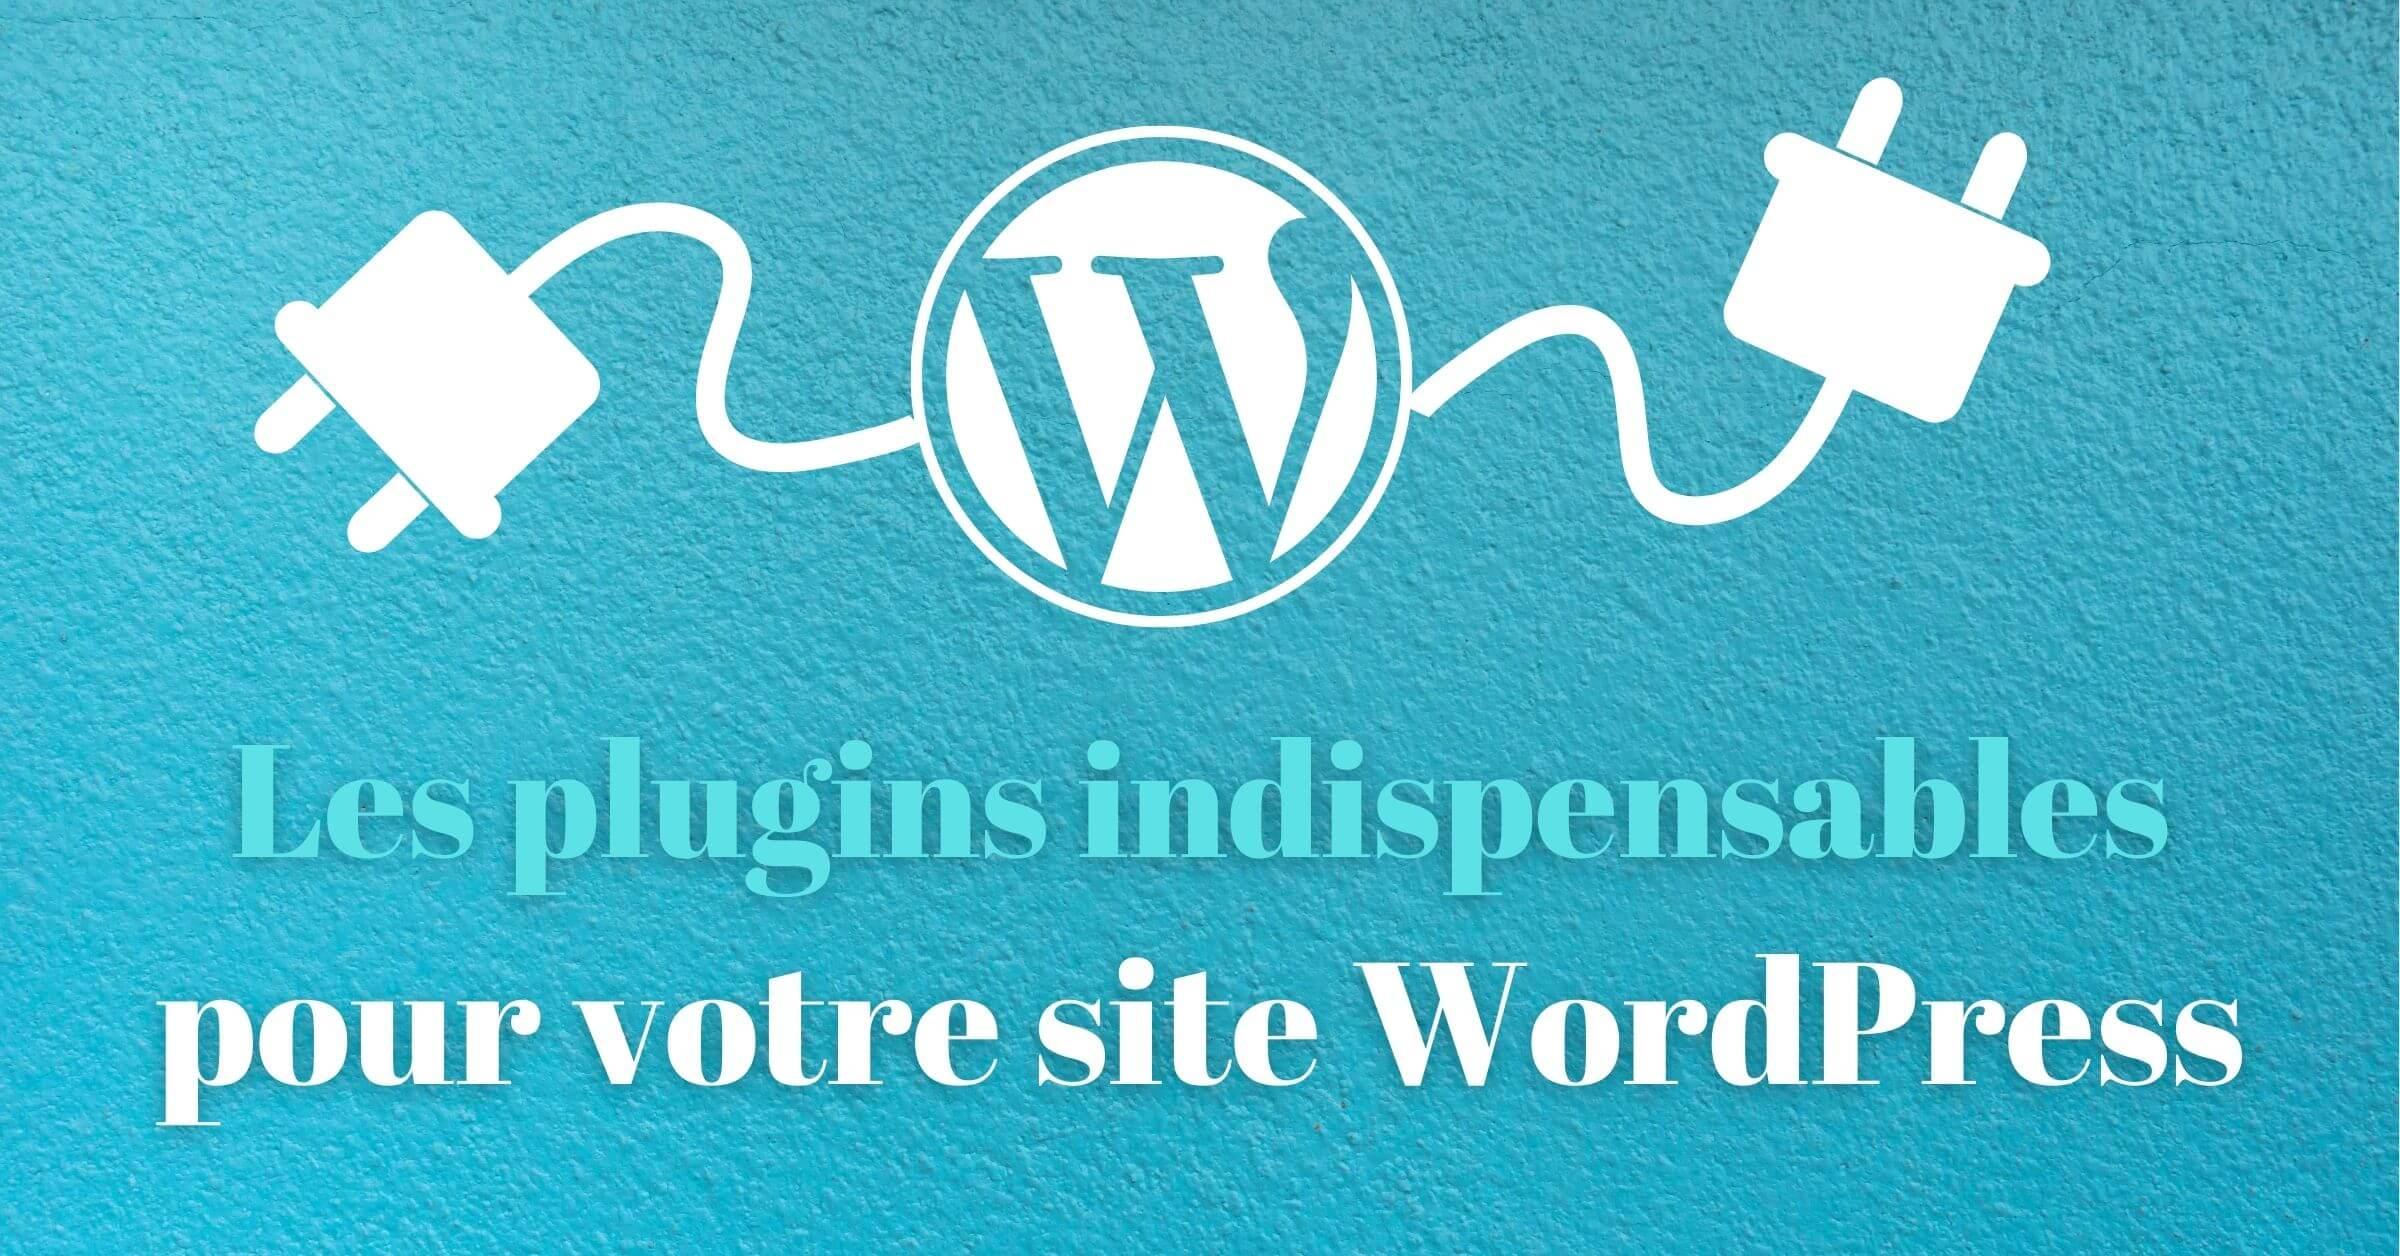 meilleurs plugins wordpress indispensable